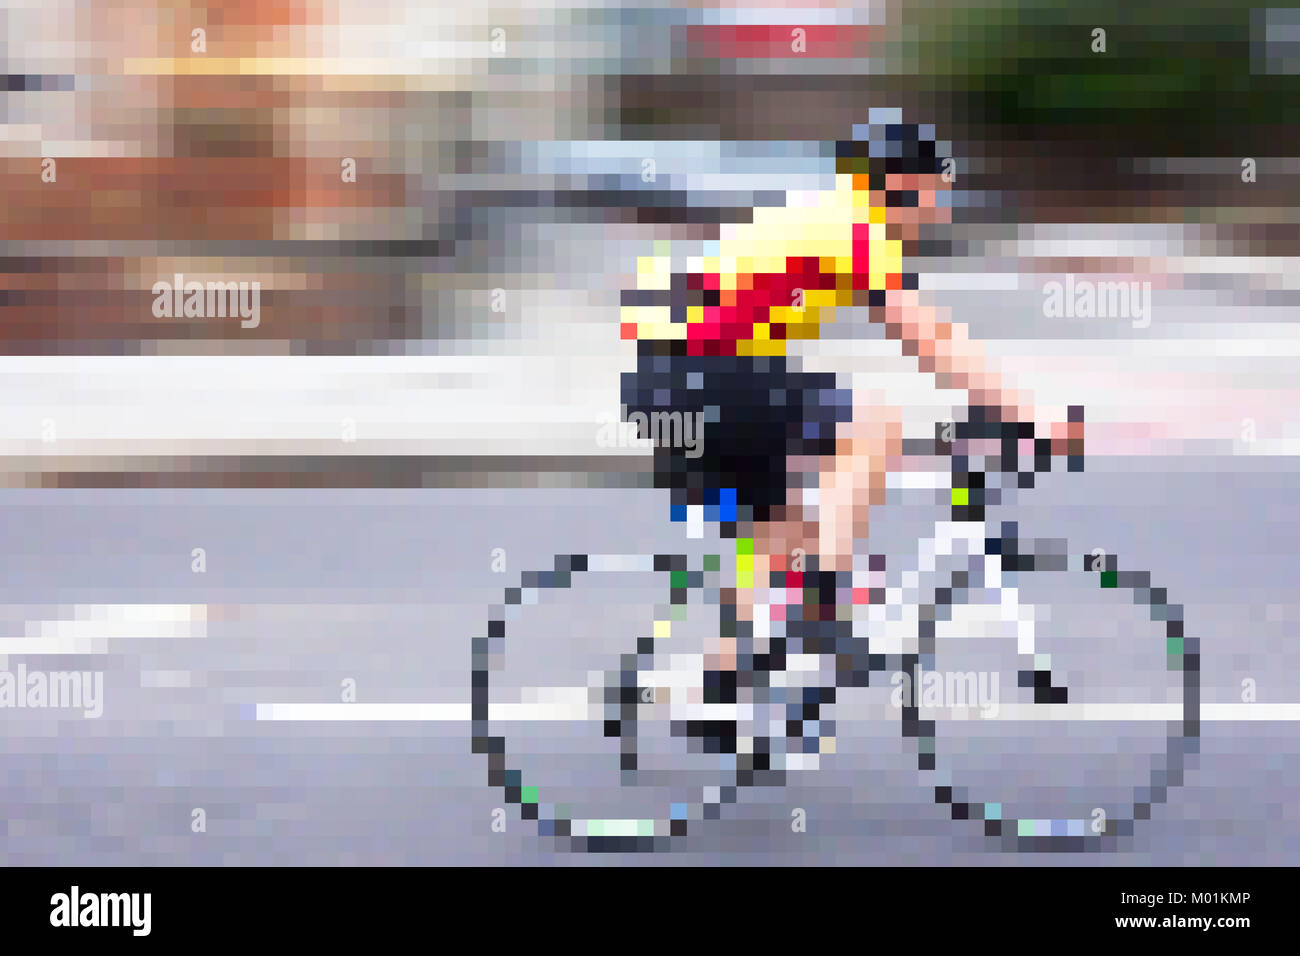 Minecraft style cyclist, artwork reflecting on galloping technology in digital era.London,United Kingdom. - Stock Image